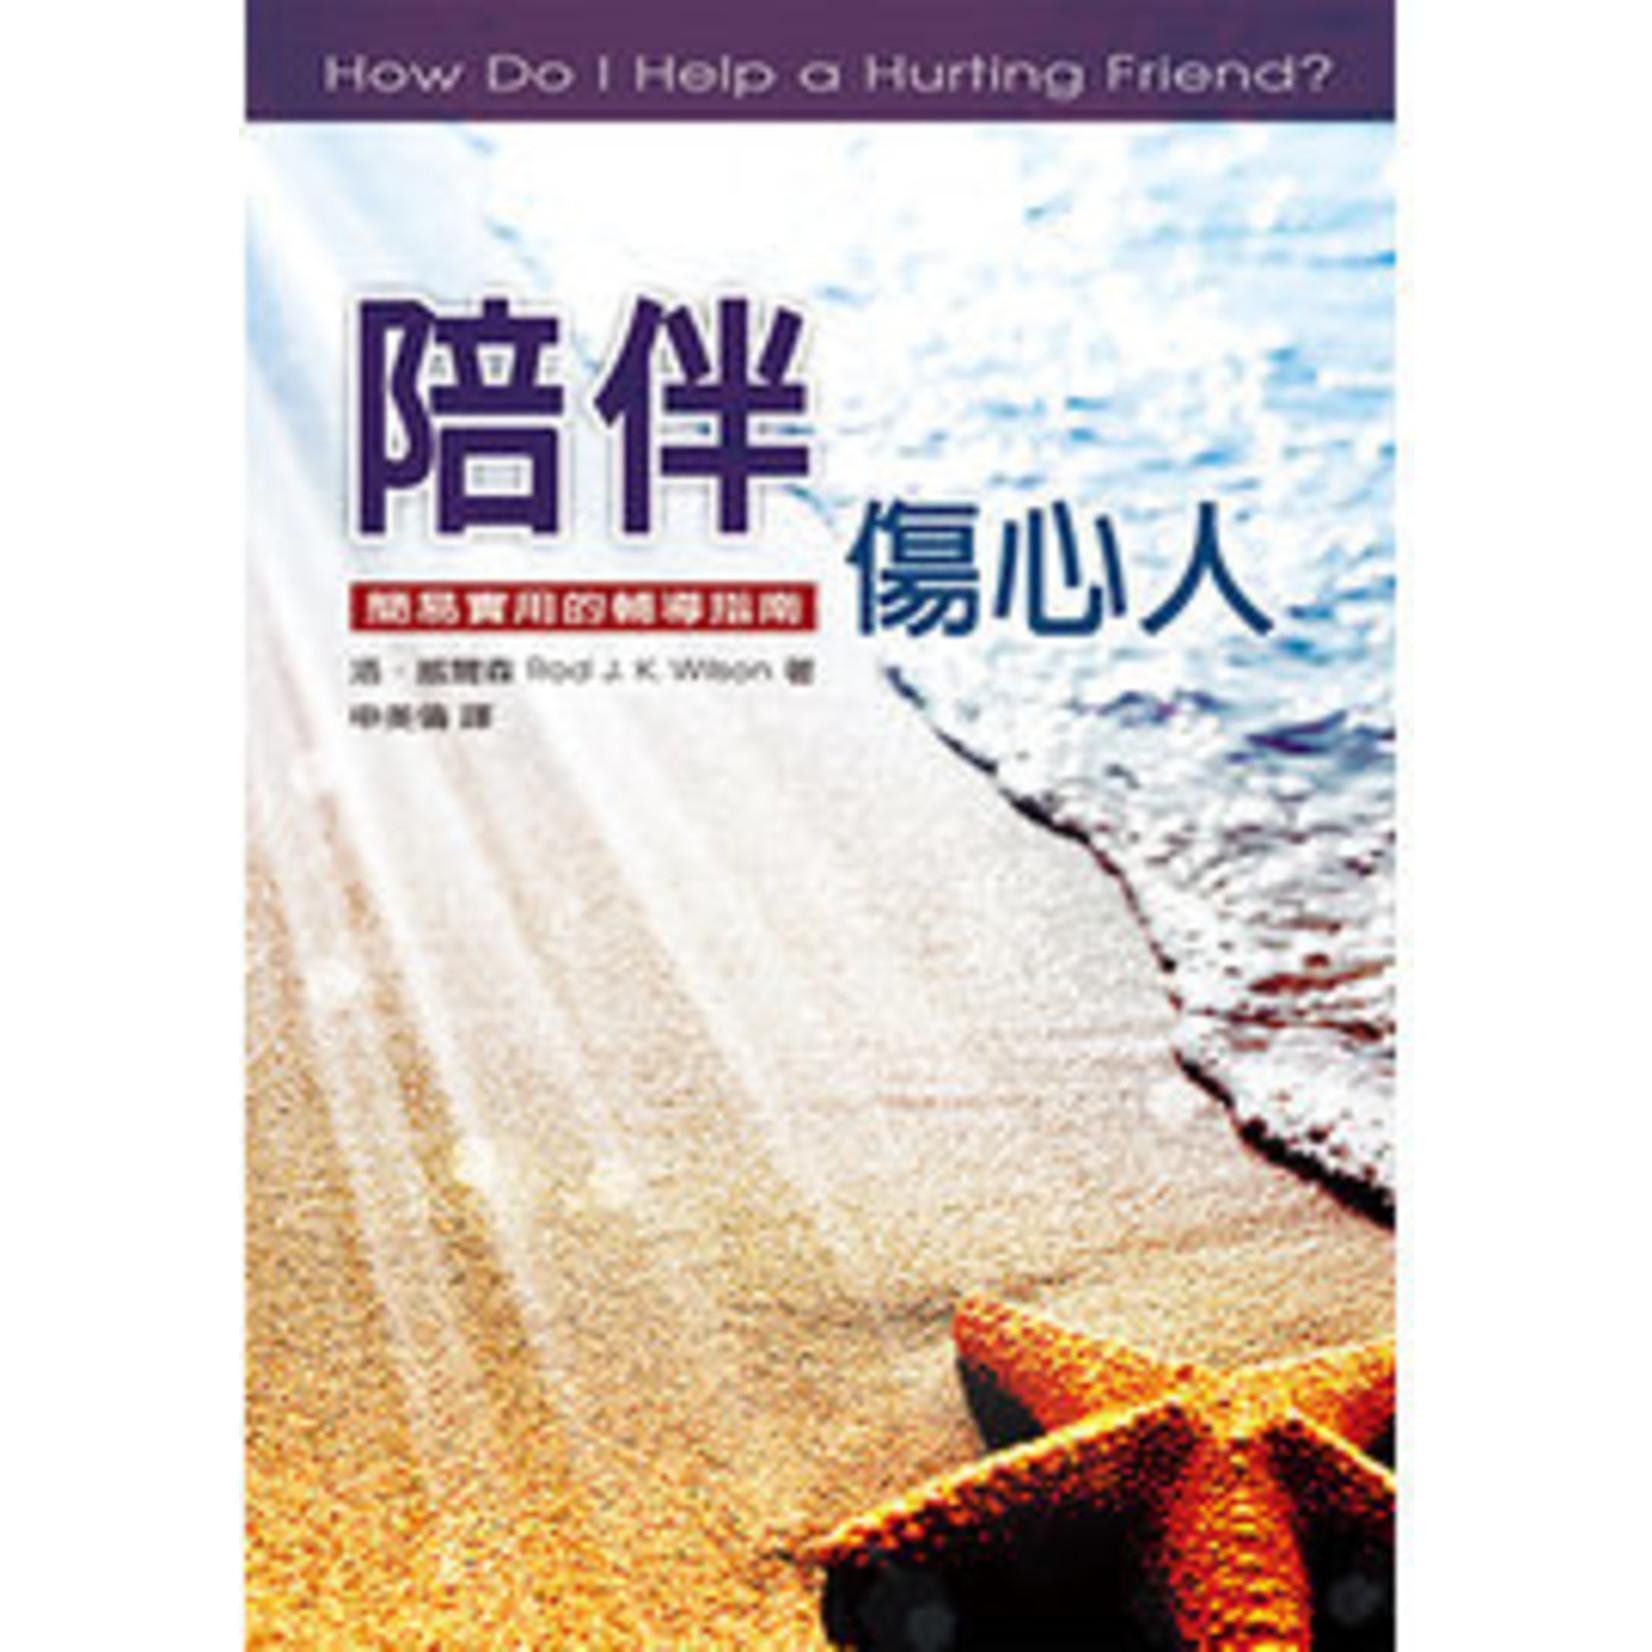 天恩 Grace Publishing House 陪伴傷心人:簡易實用的輔導指南 How Do I Help a Hurting Friend